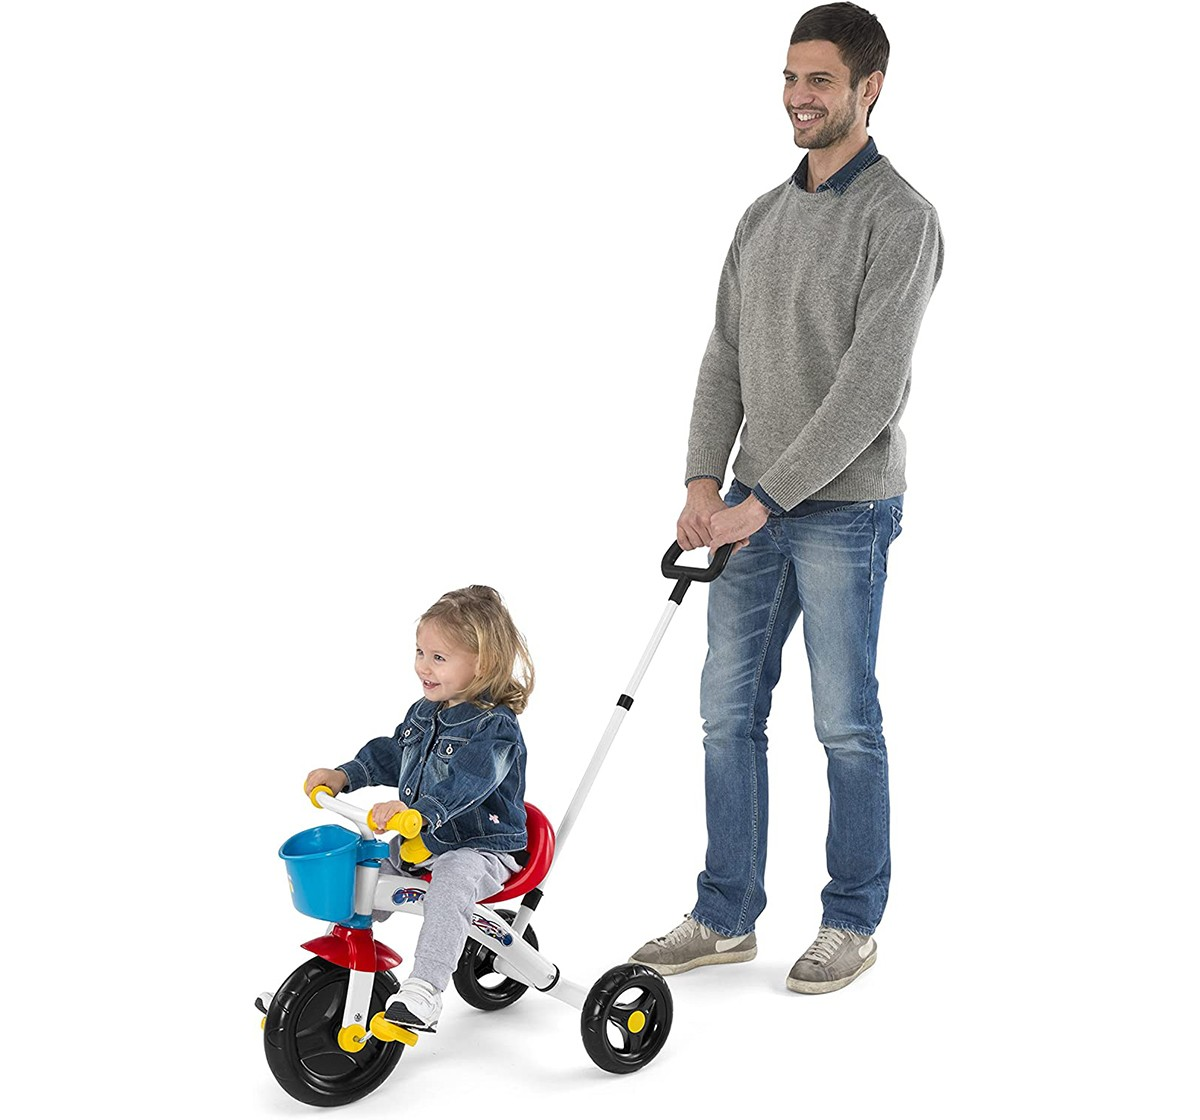 Chicco U-Go Trike Trike for Kids age 18M +